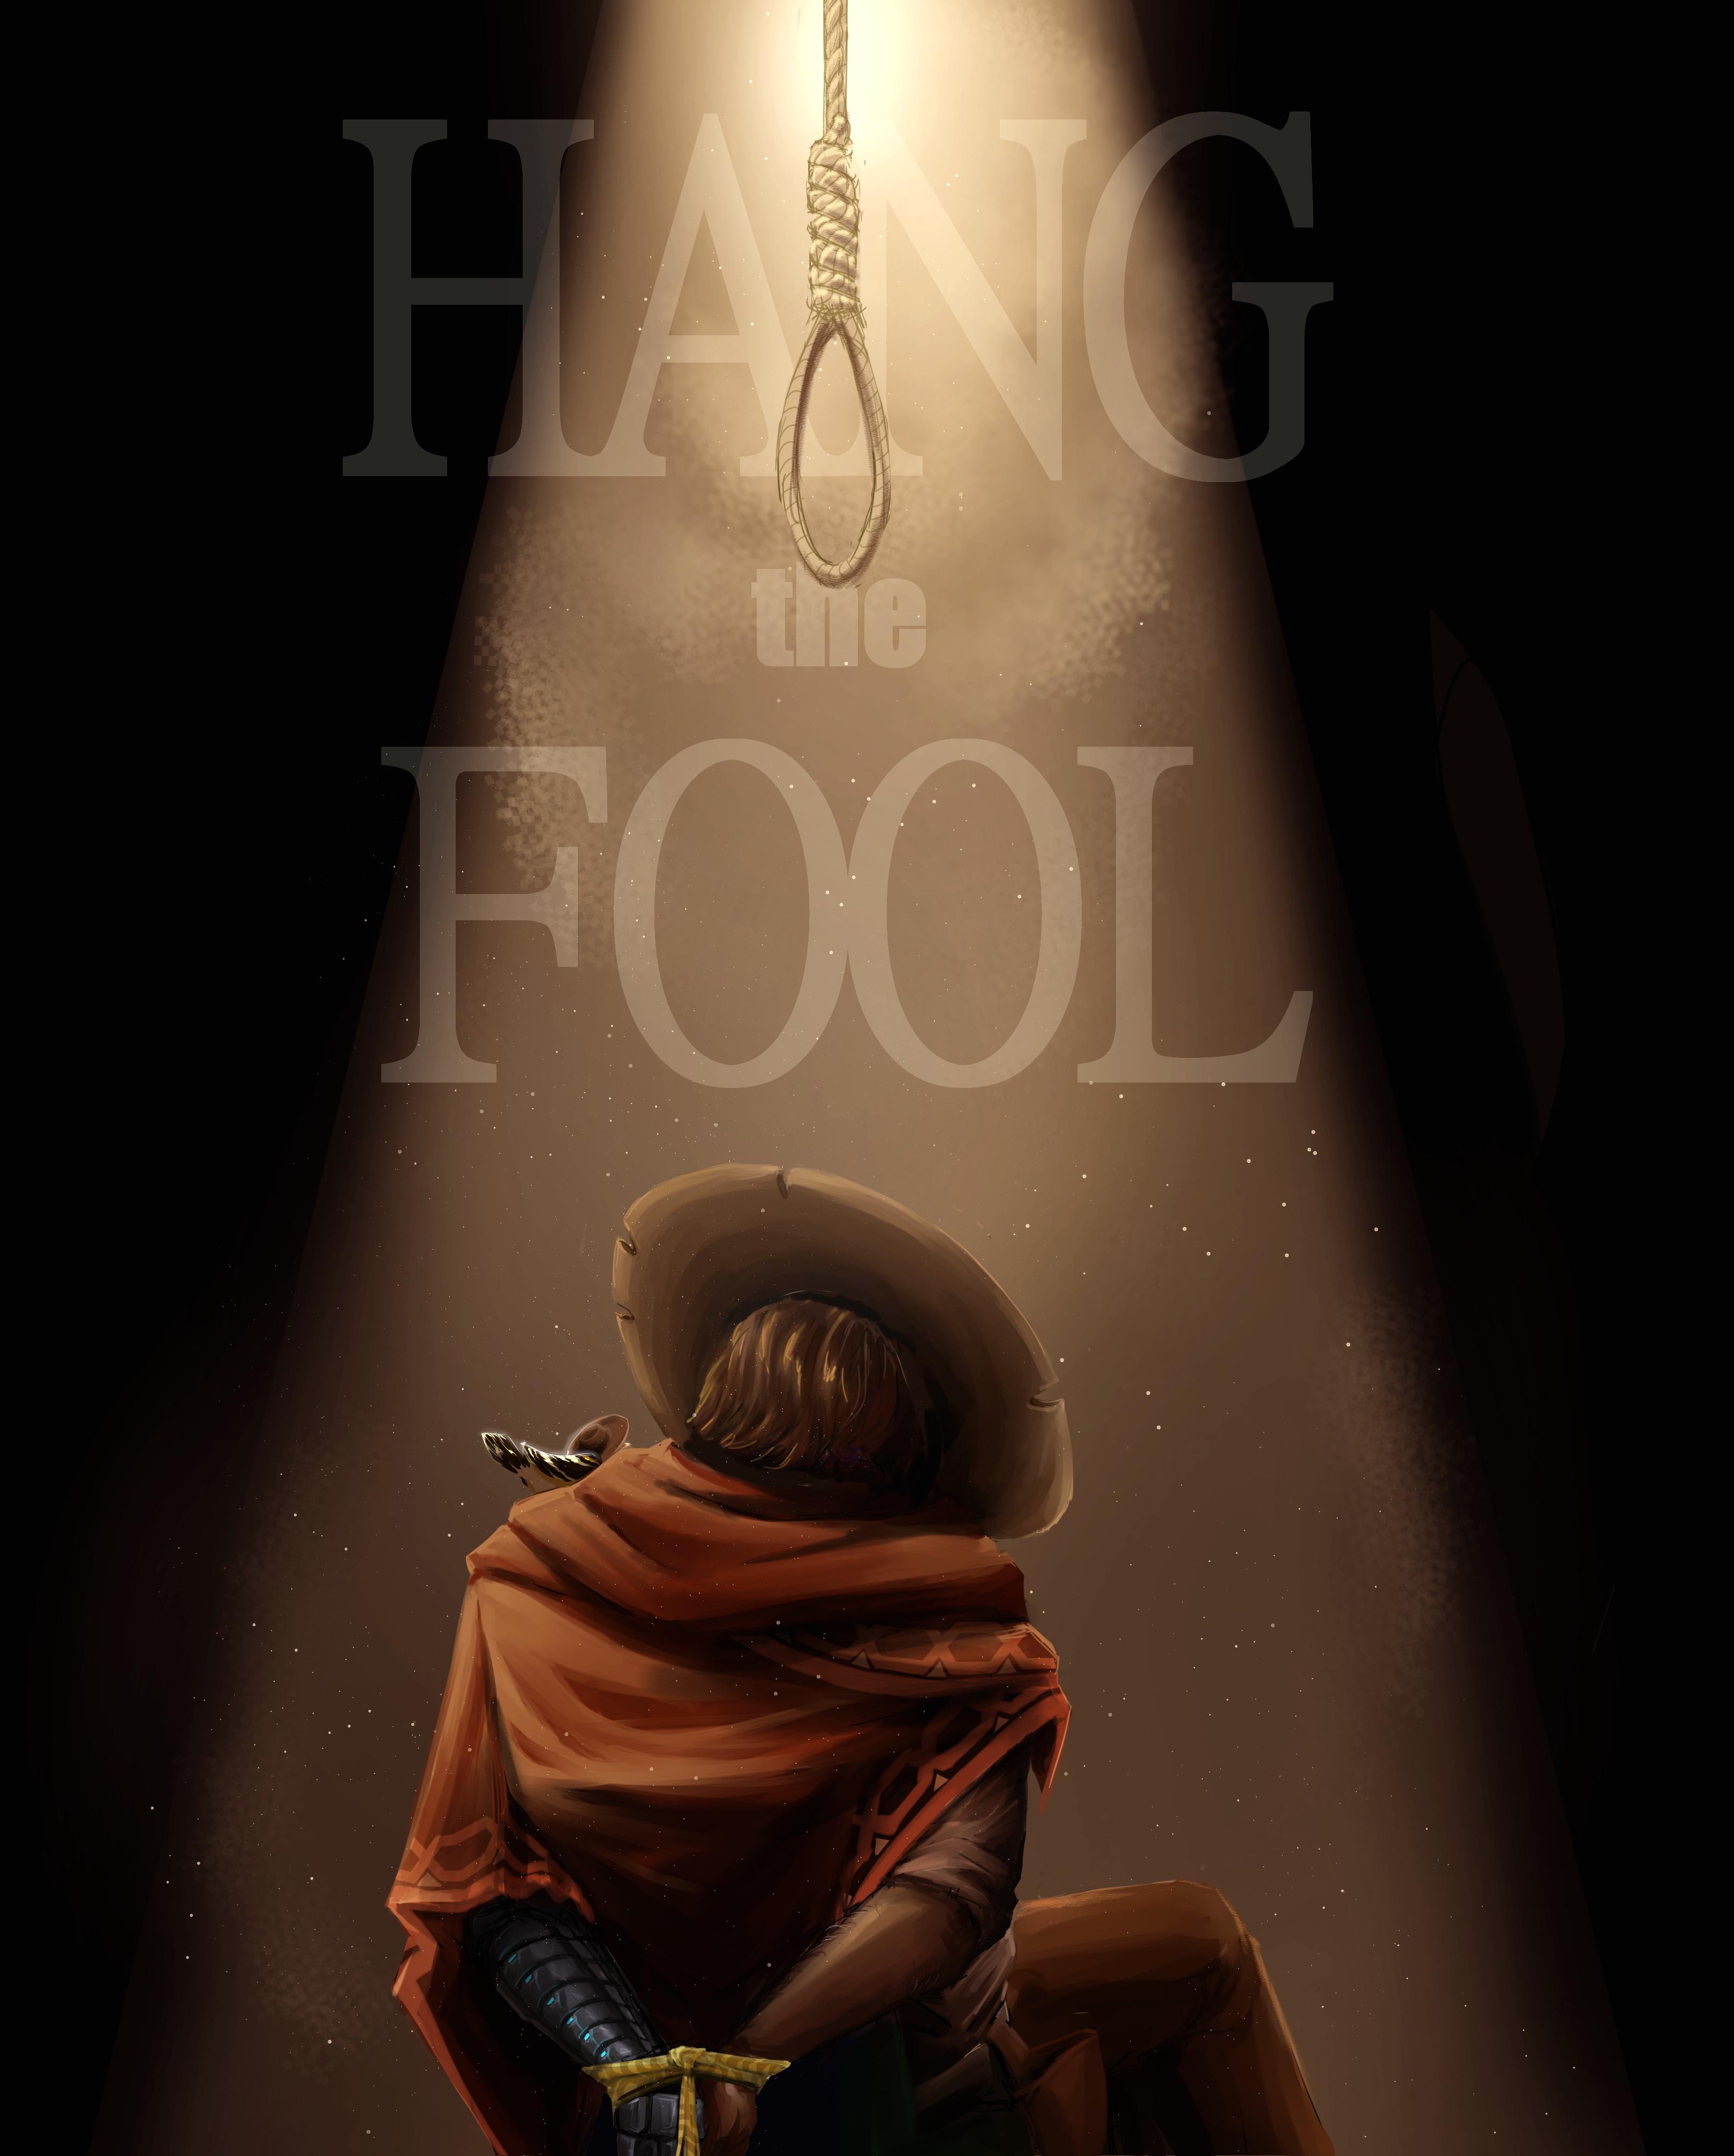 Hang the Fool